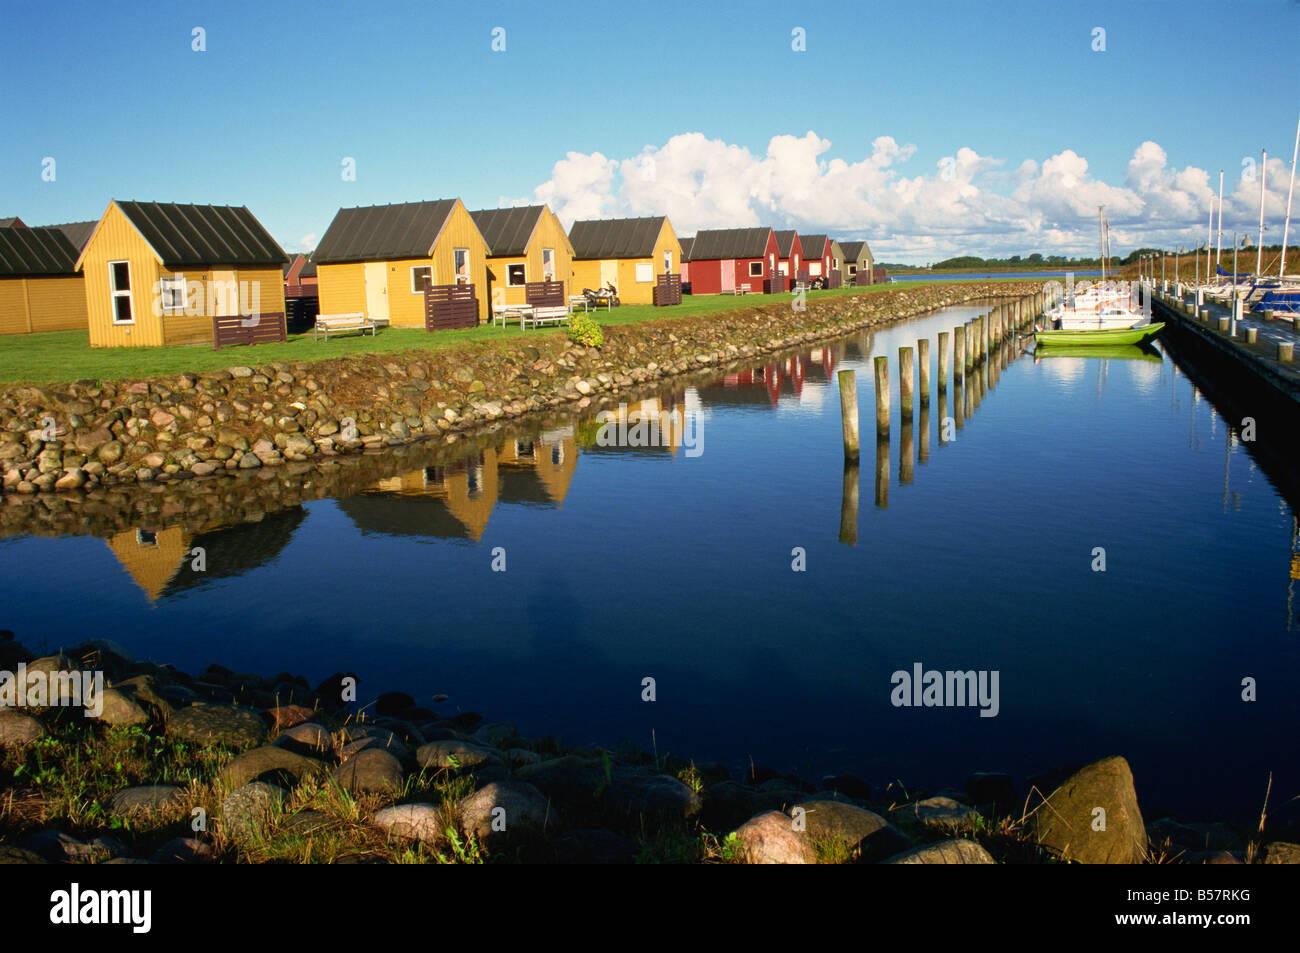 Marina and youth hostel cabins Aalborg north Jutland Denmark Scandinavia Europe - Stock Image